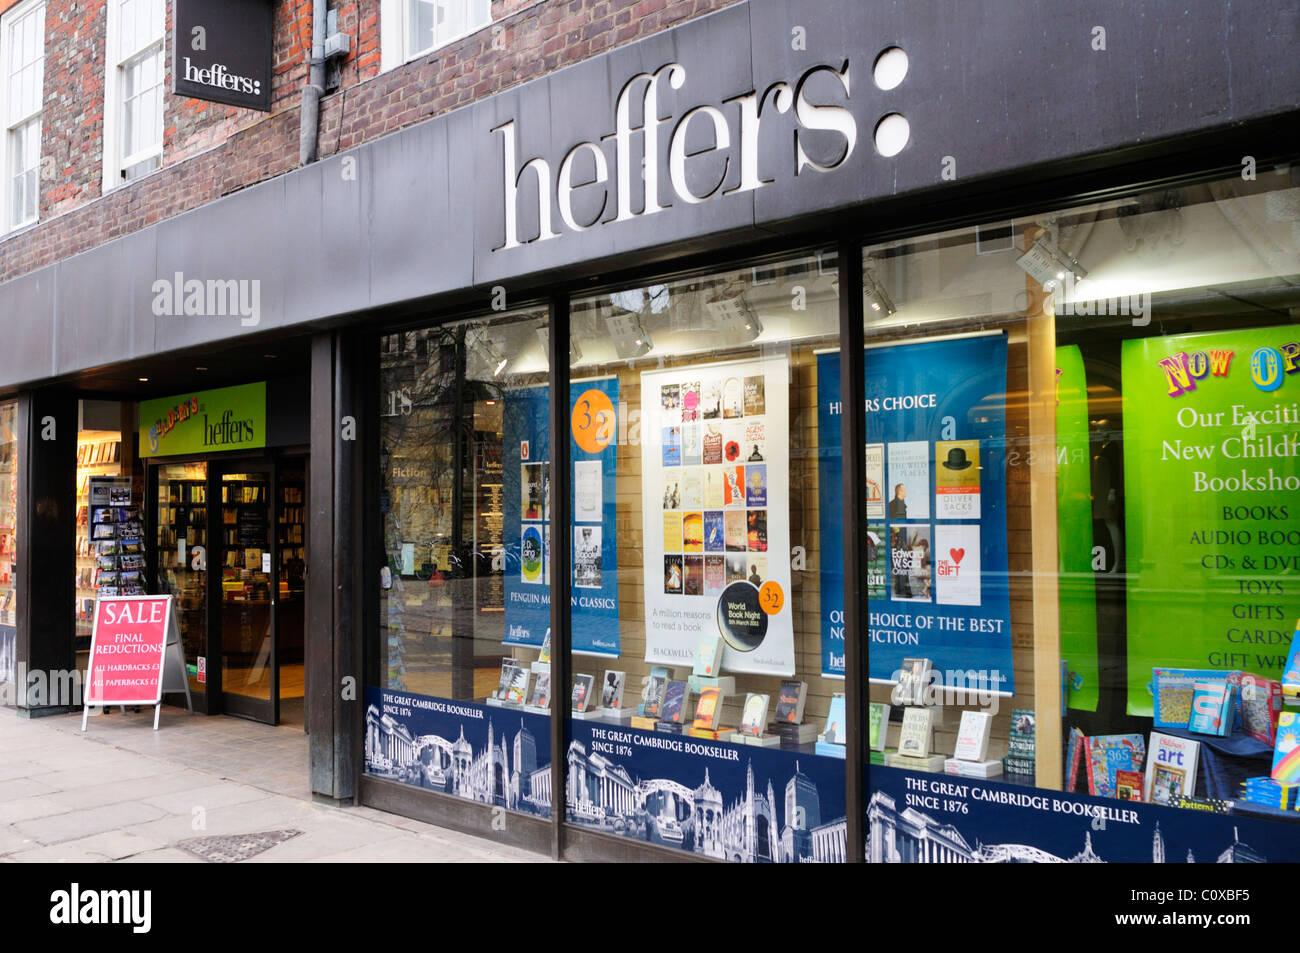 Heffers Bookshop, Trinity Street, Cambridge, England, UK - Stock Image